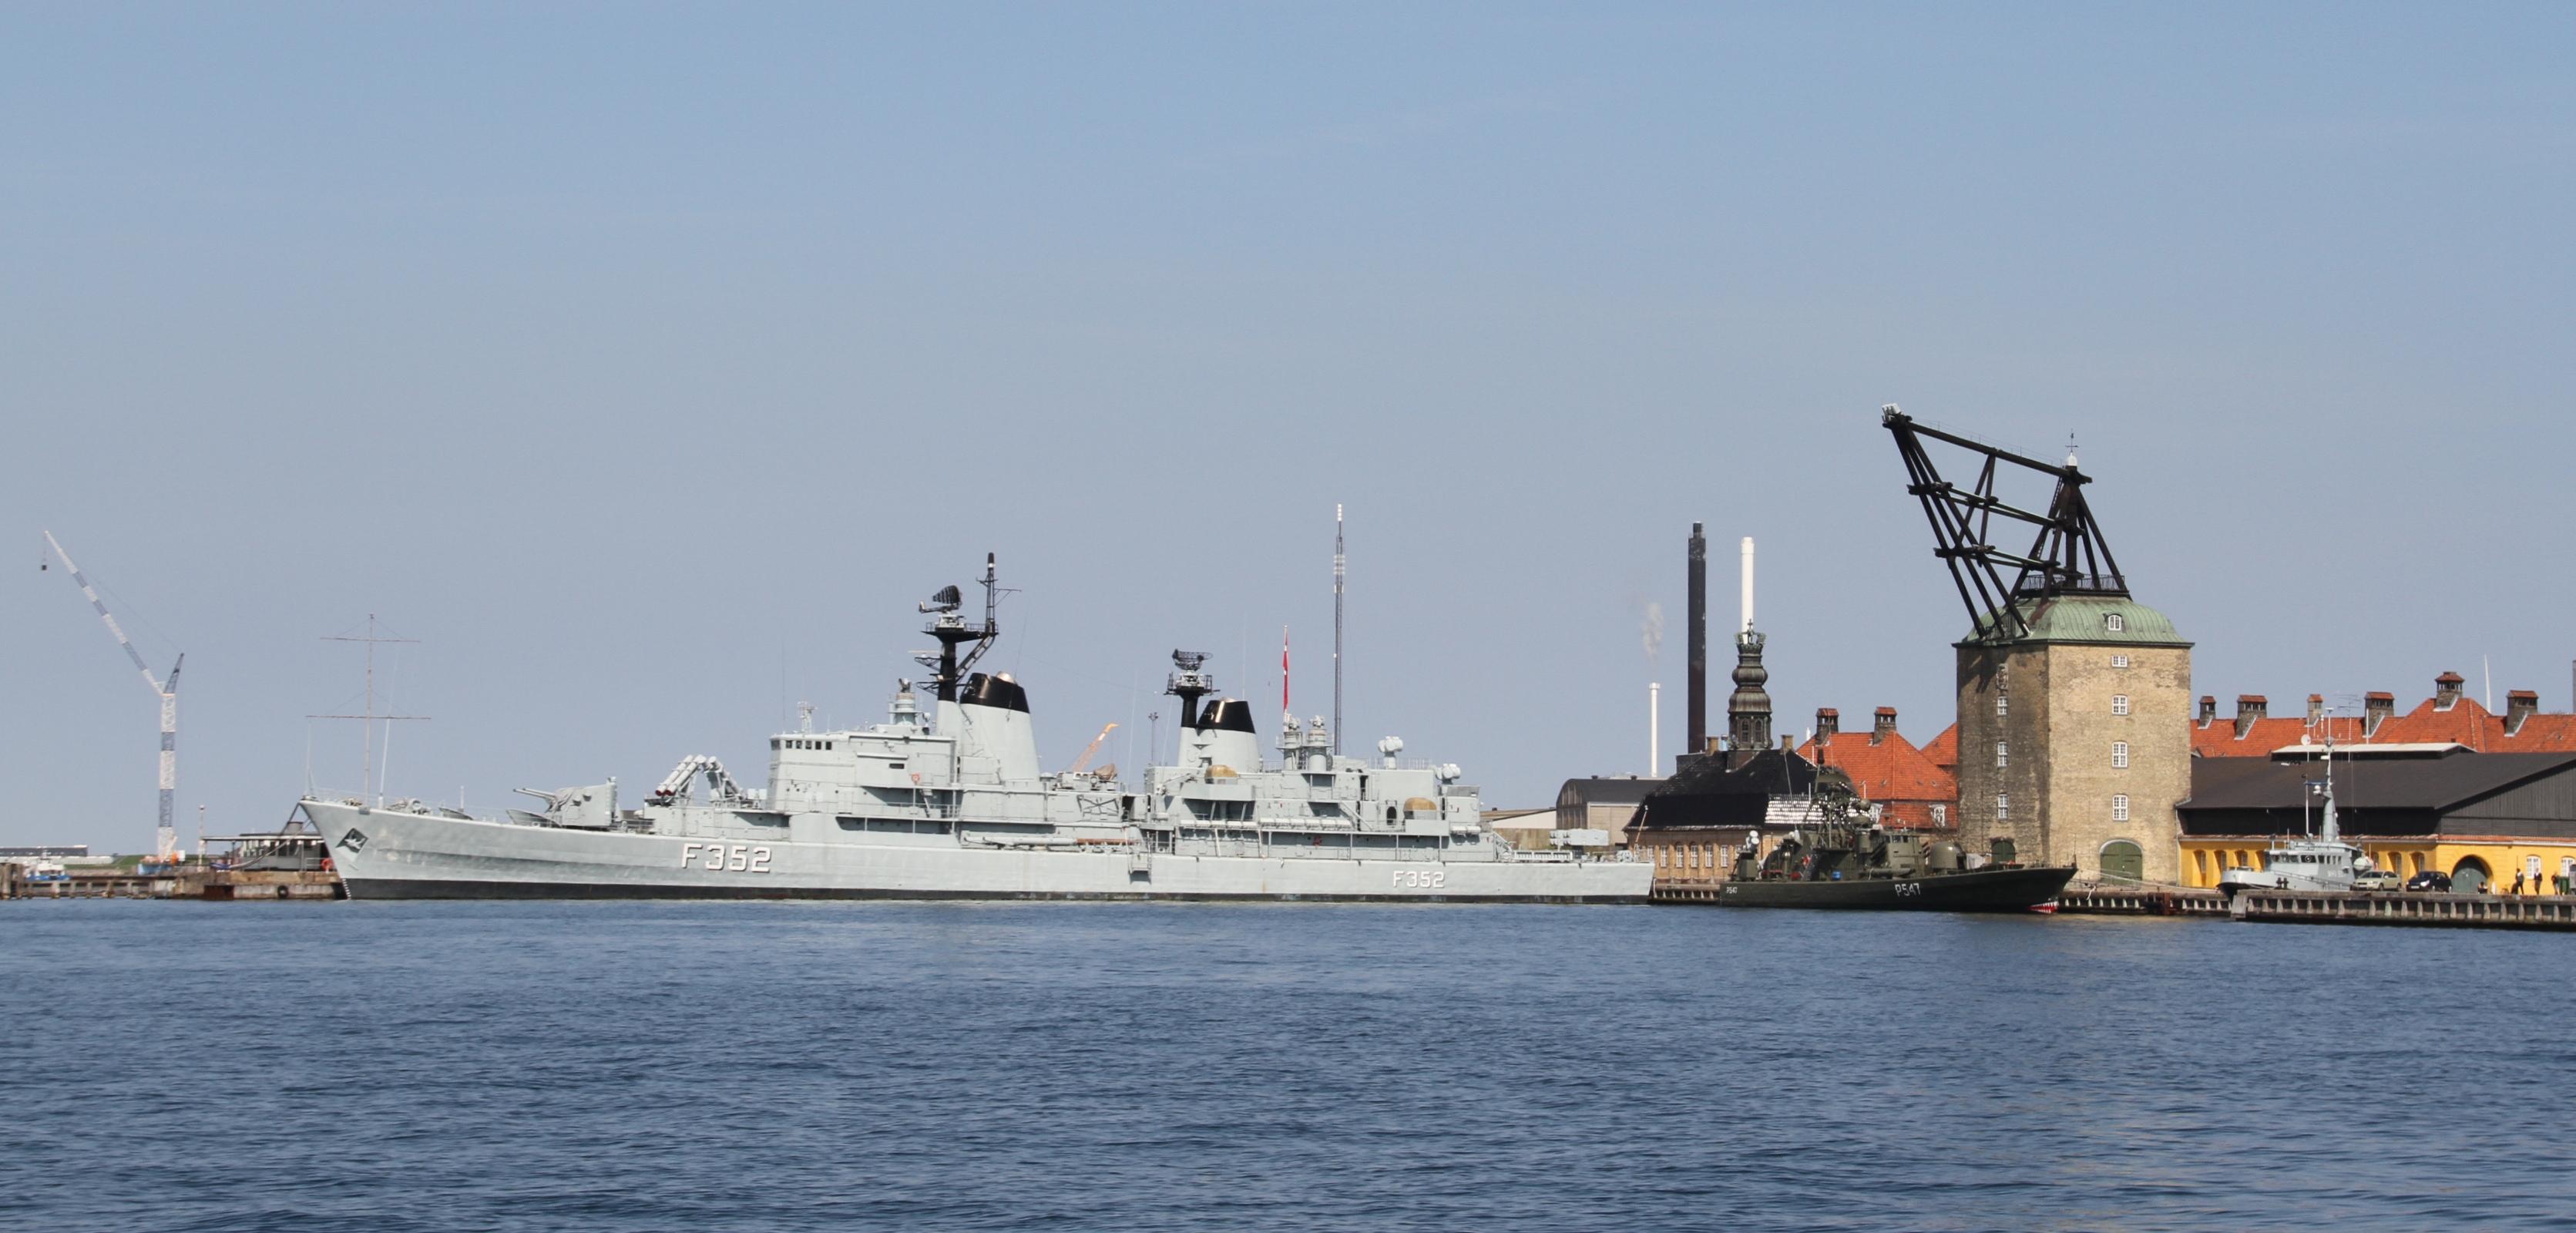 Filecopenhagen Museum Warships Peder Skram And Sehested Img 5503